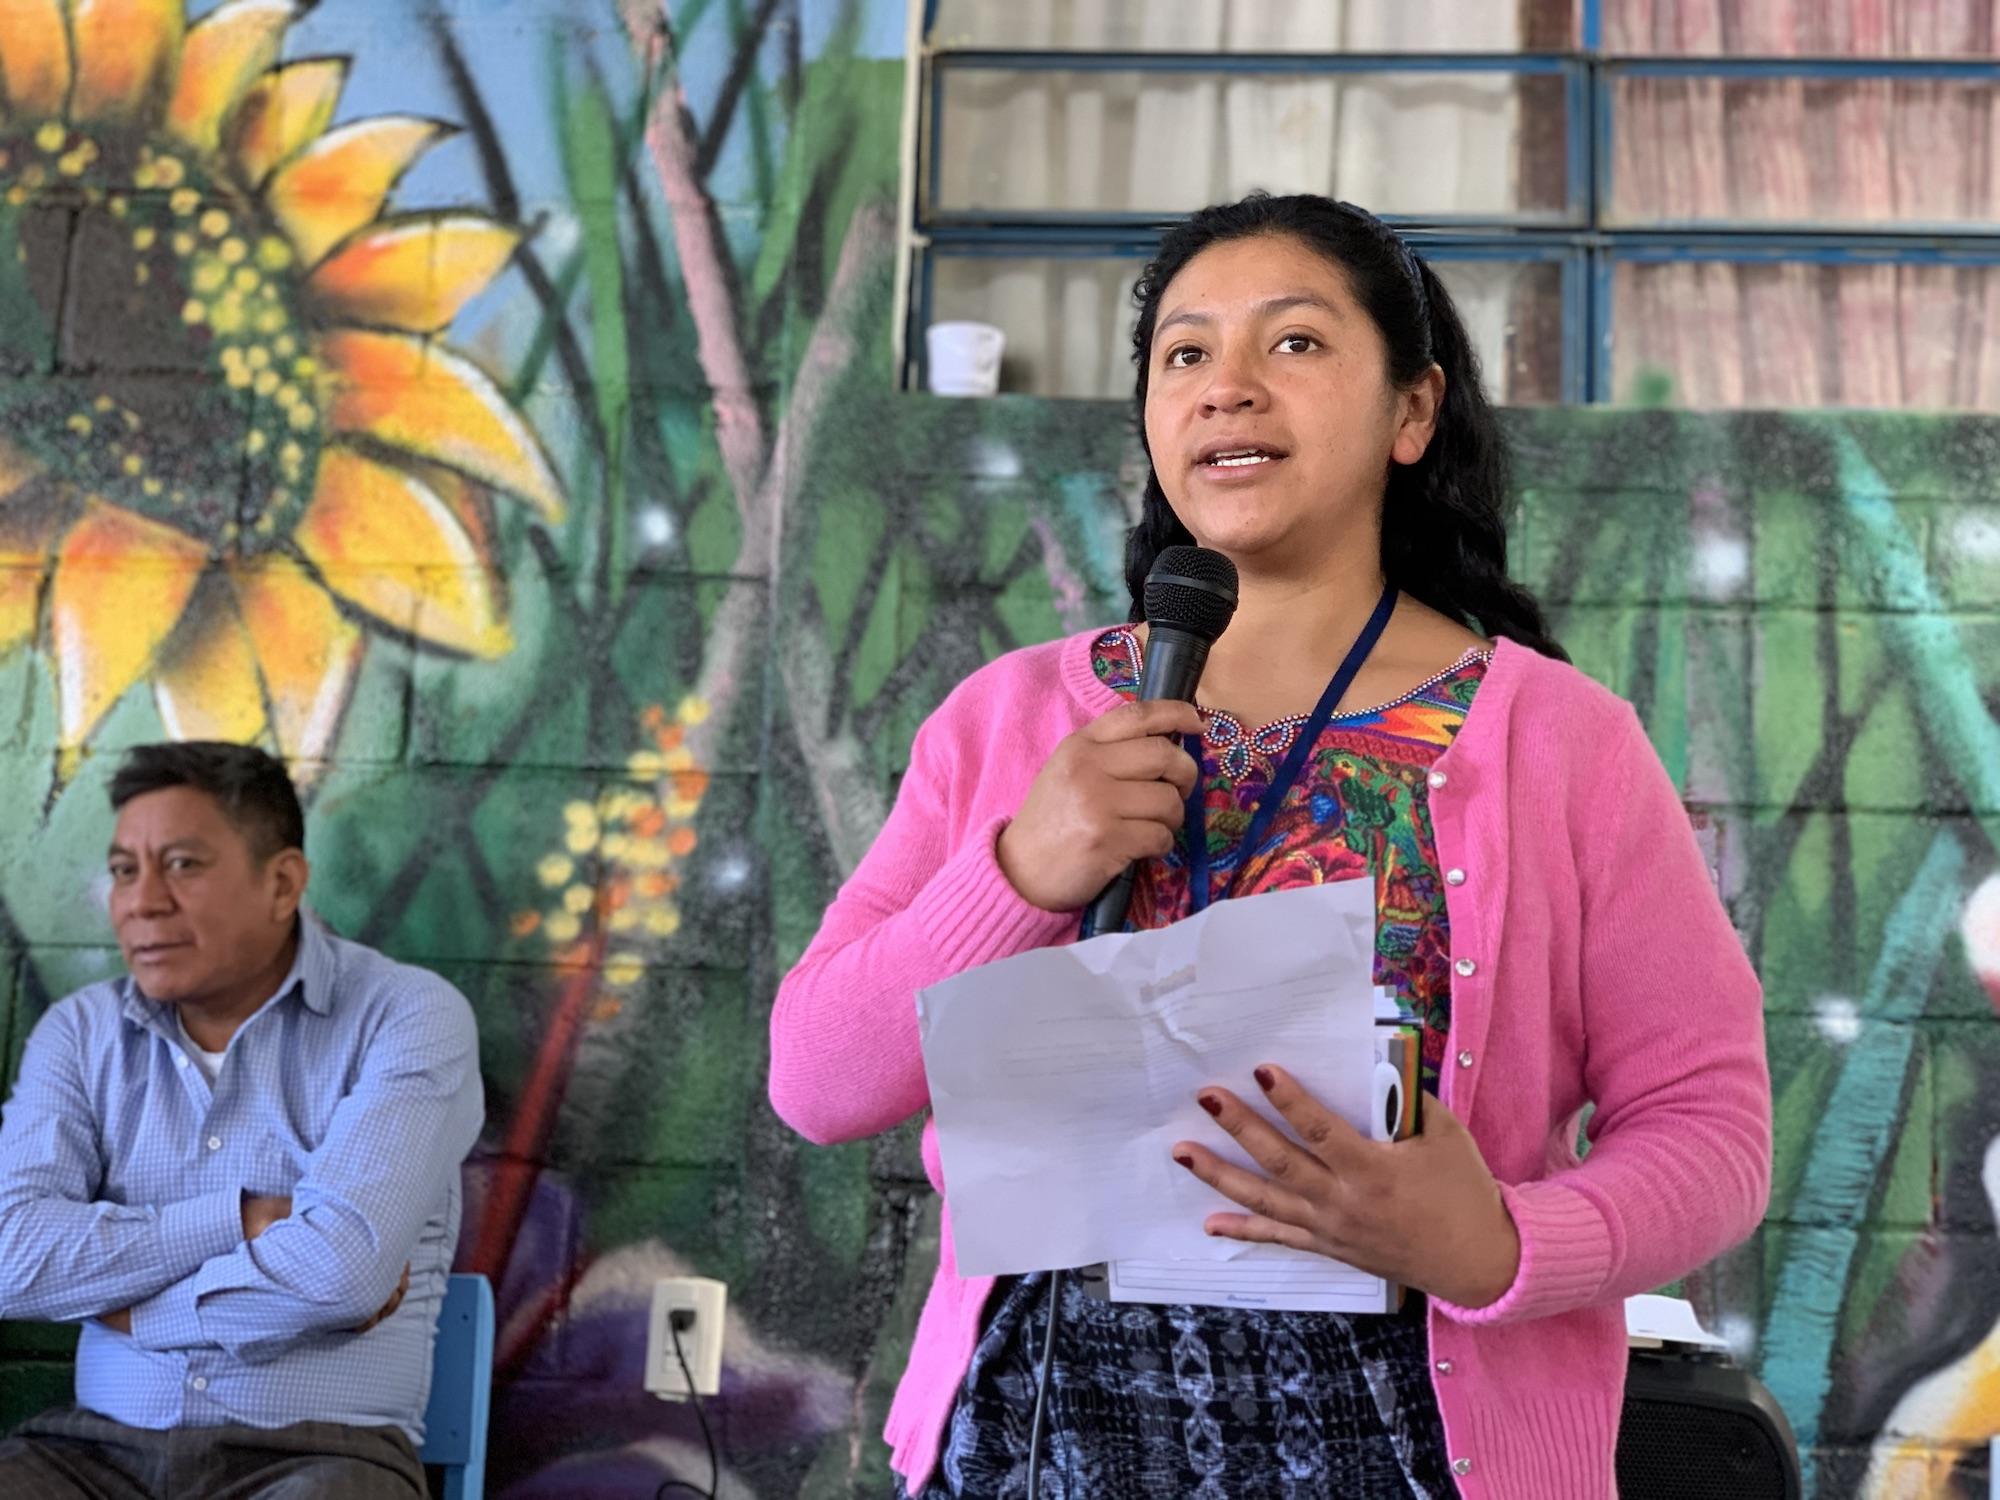 Indigenous woman Guatemala speaking into microphone